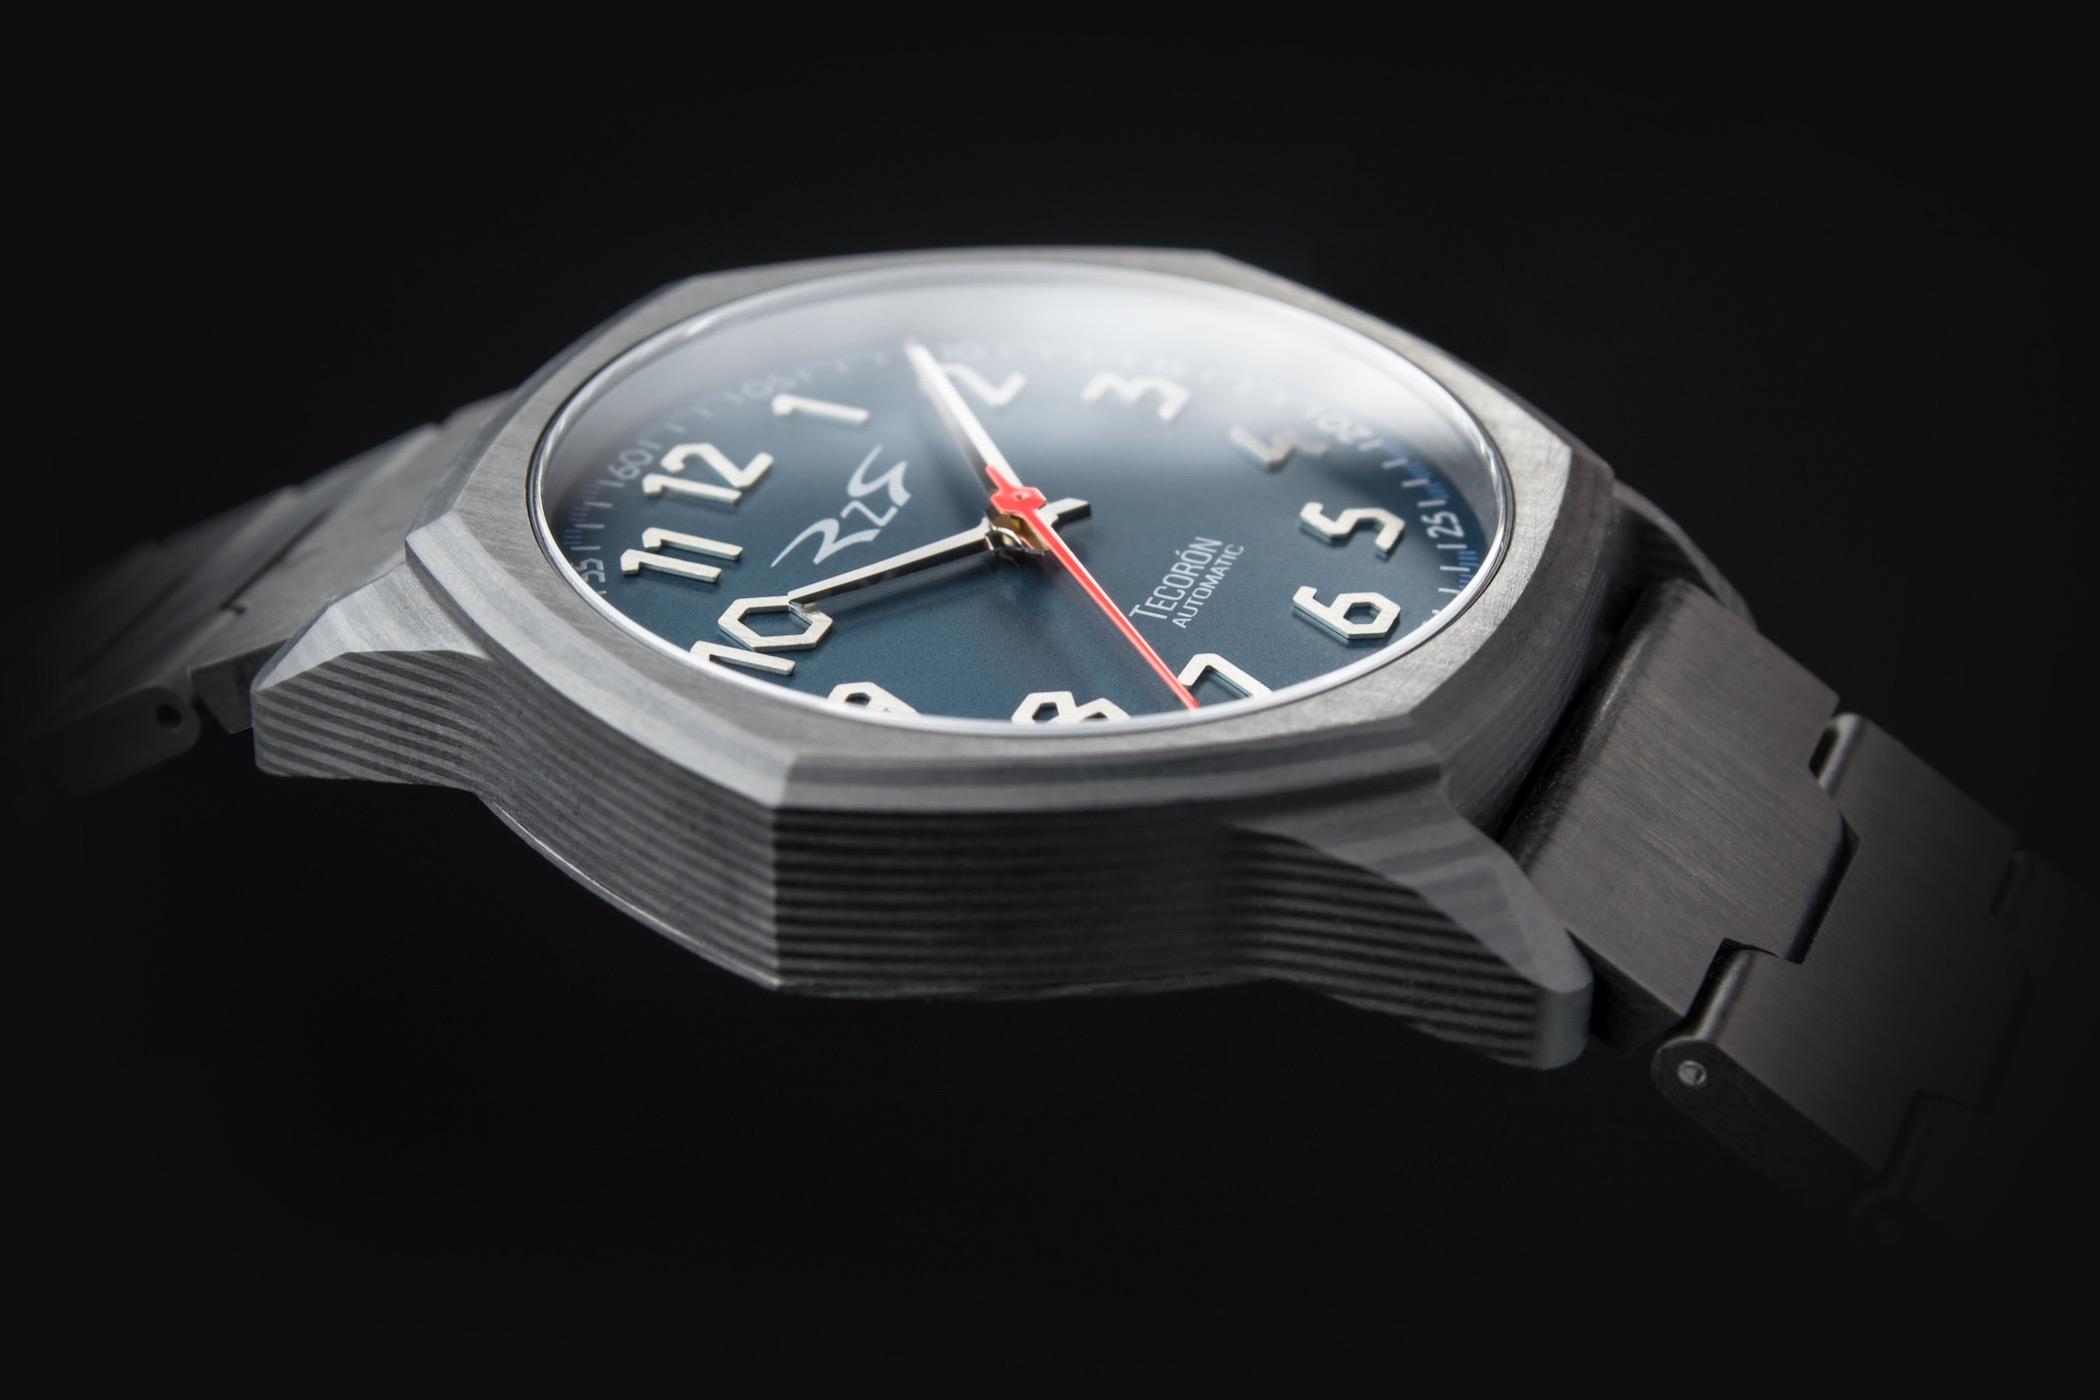 RzR Tecoron Carbon Fibre Watch Kickstarter